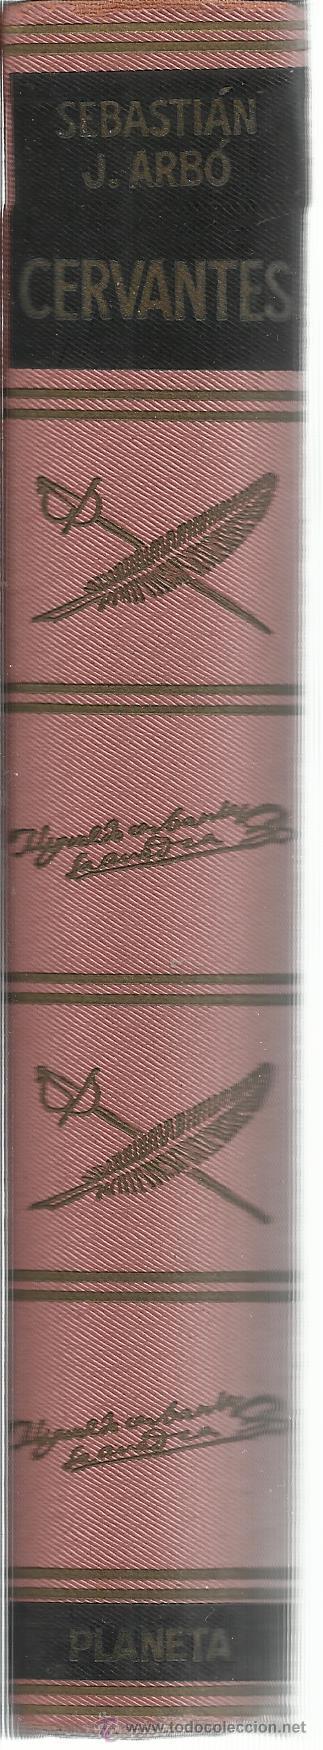 Libros de segunda mano: CERVANTES. SEBASTIÁN JUAN ARBÓ. EDITORIAL PLANETA. BARCELONA. 1971 - Foto 3 - 41041267